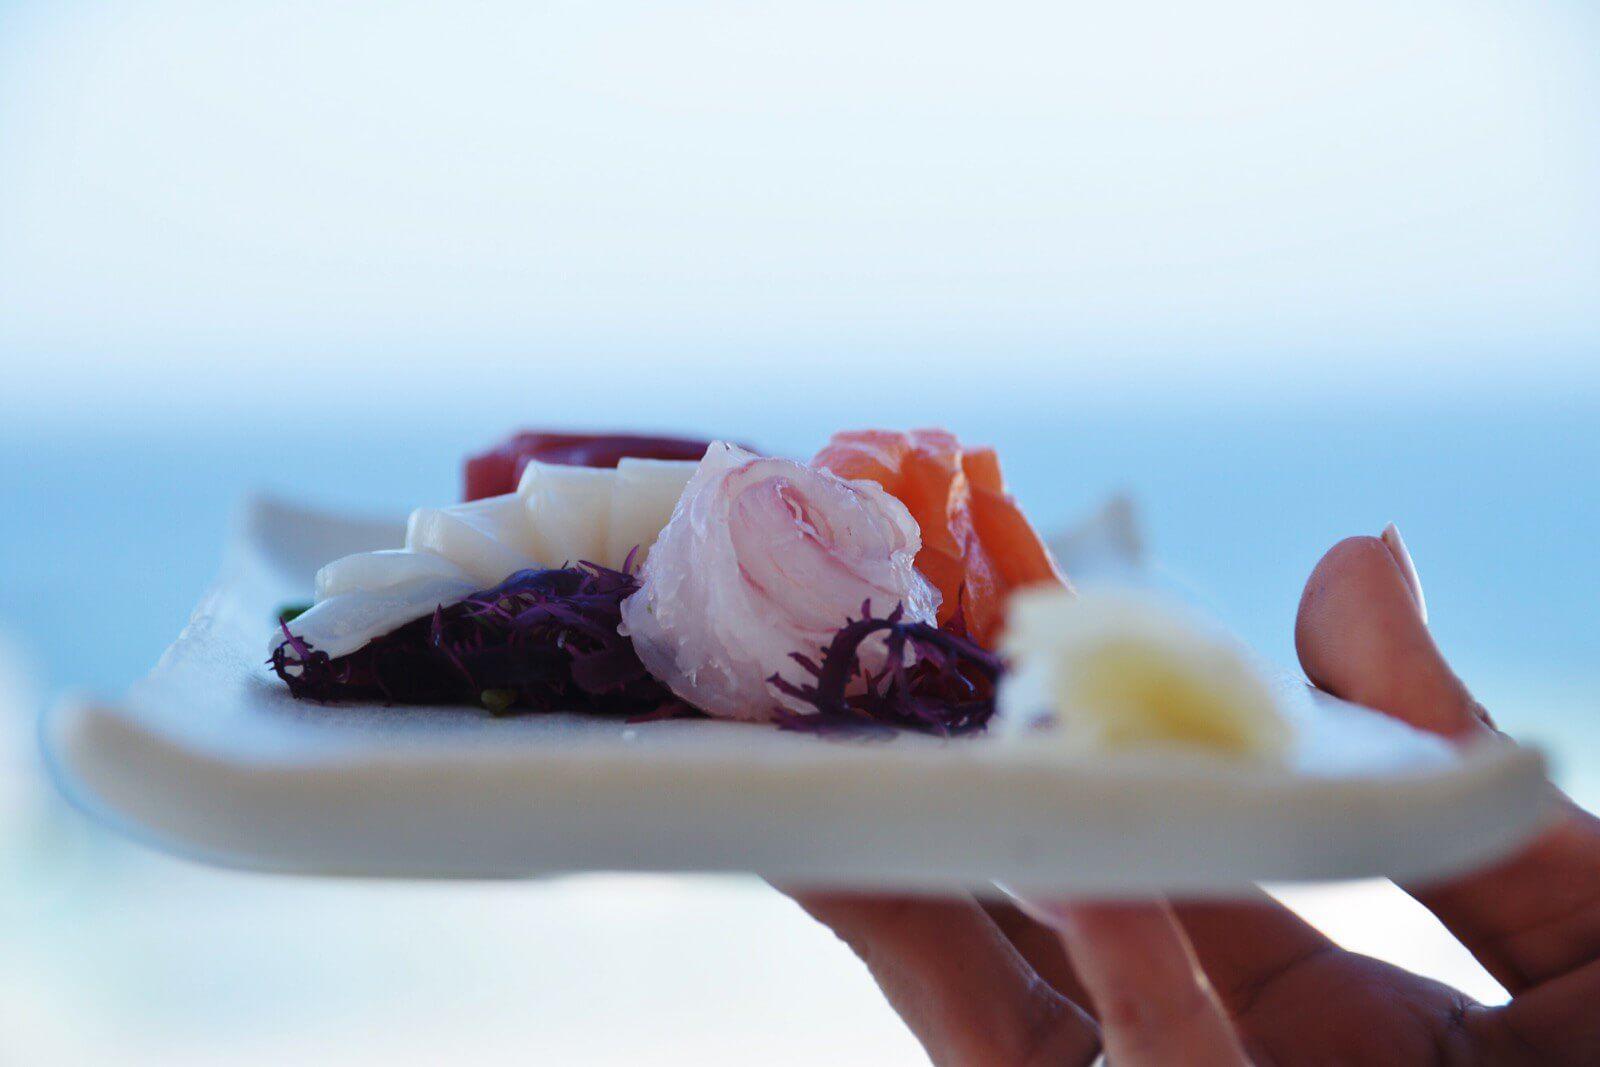 https://www.white-ibiza.com/wp-content/uploads/2020/03/formentera-restaurants-kokoy-2020-01.jpg